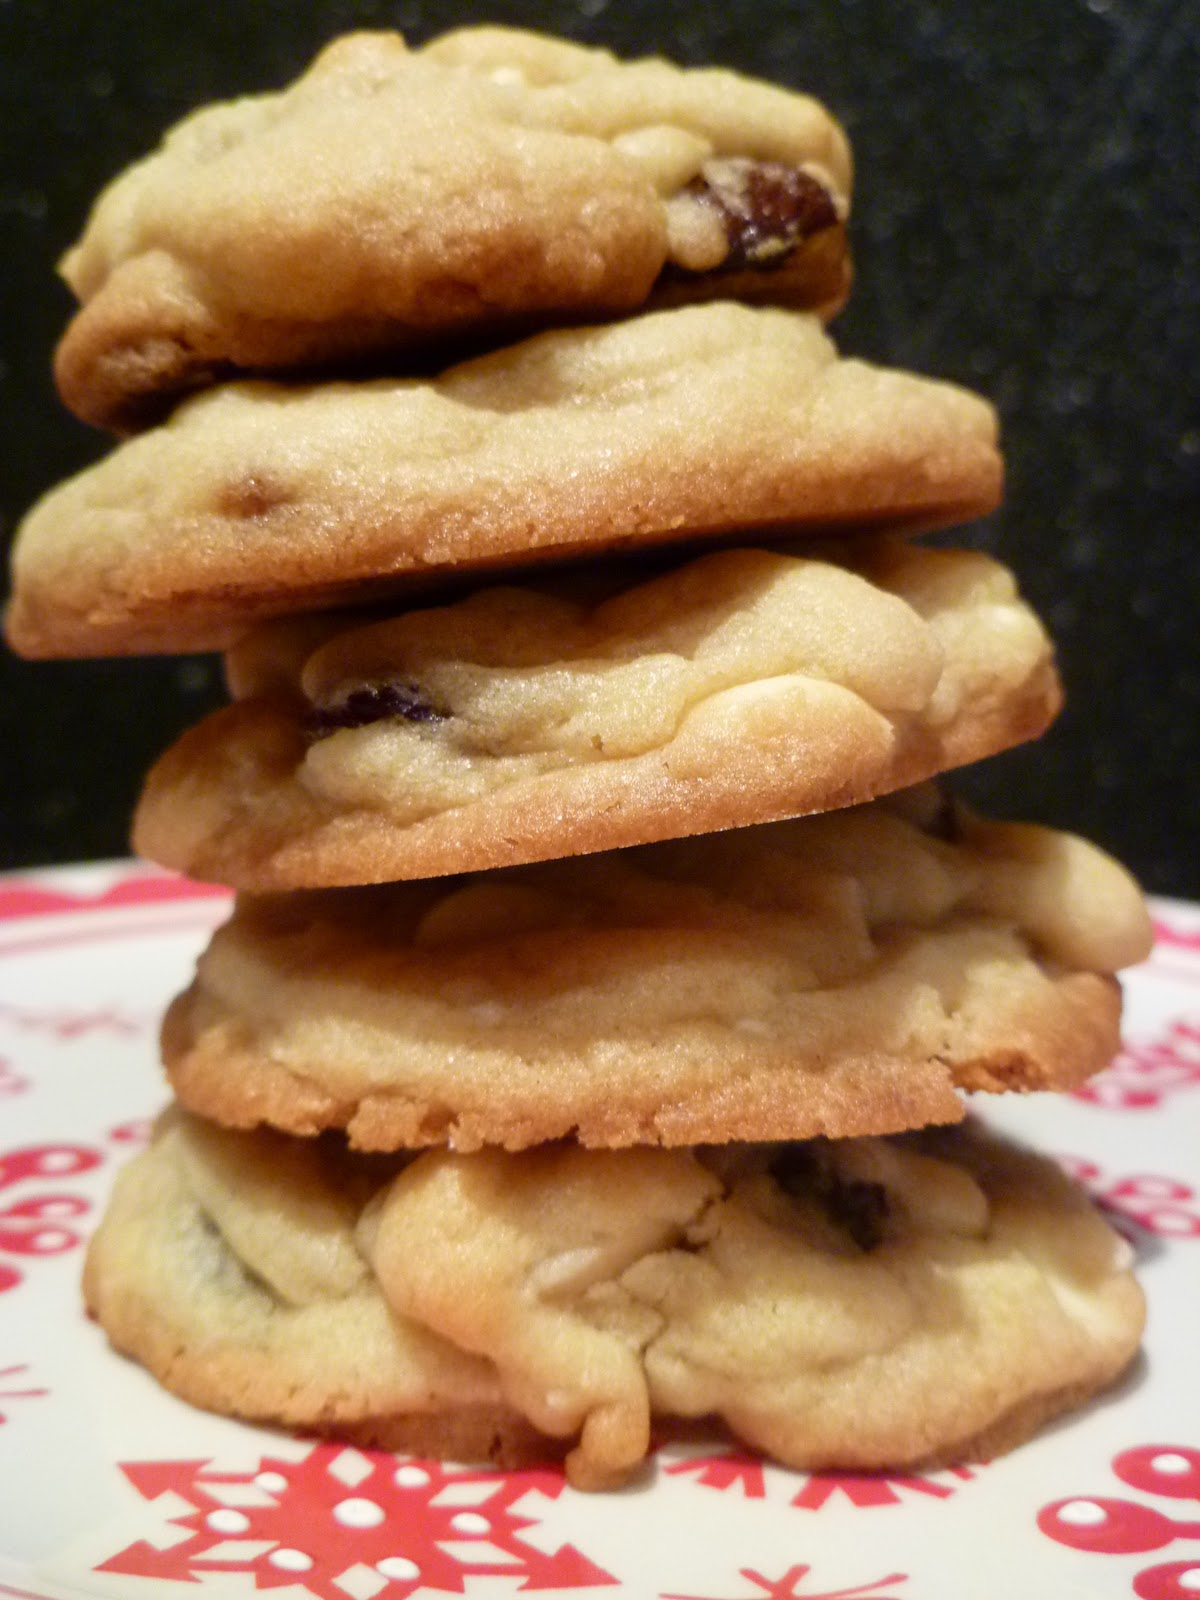 White chocolate macadamia nut cookies recipe otis spunkmeyer for White chocolate macadamia nut cookies recipe paula deen